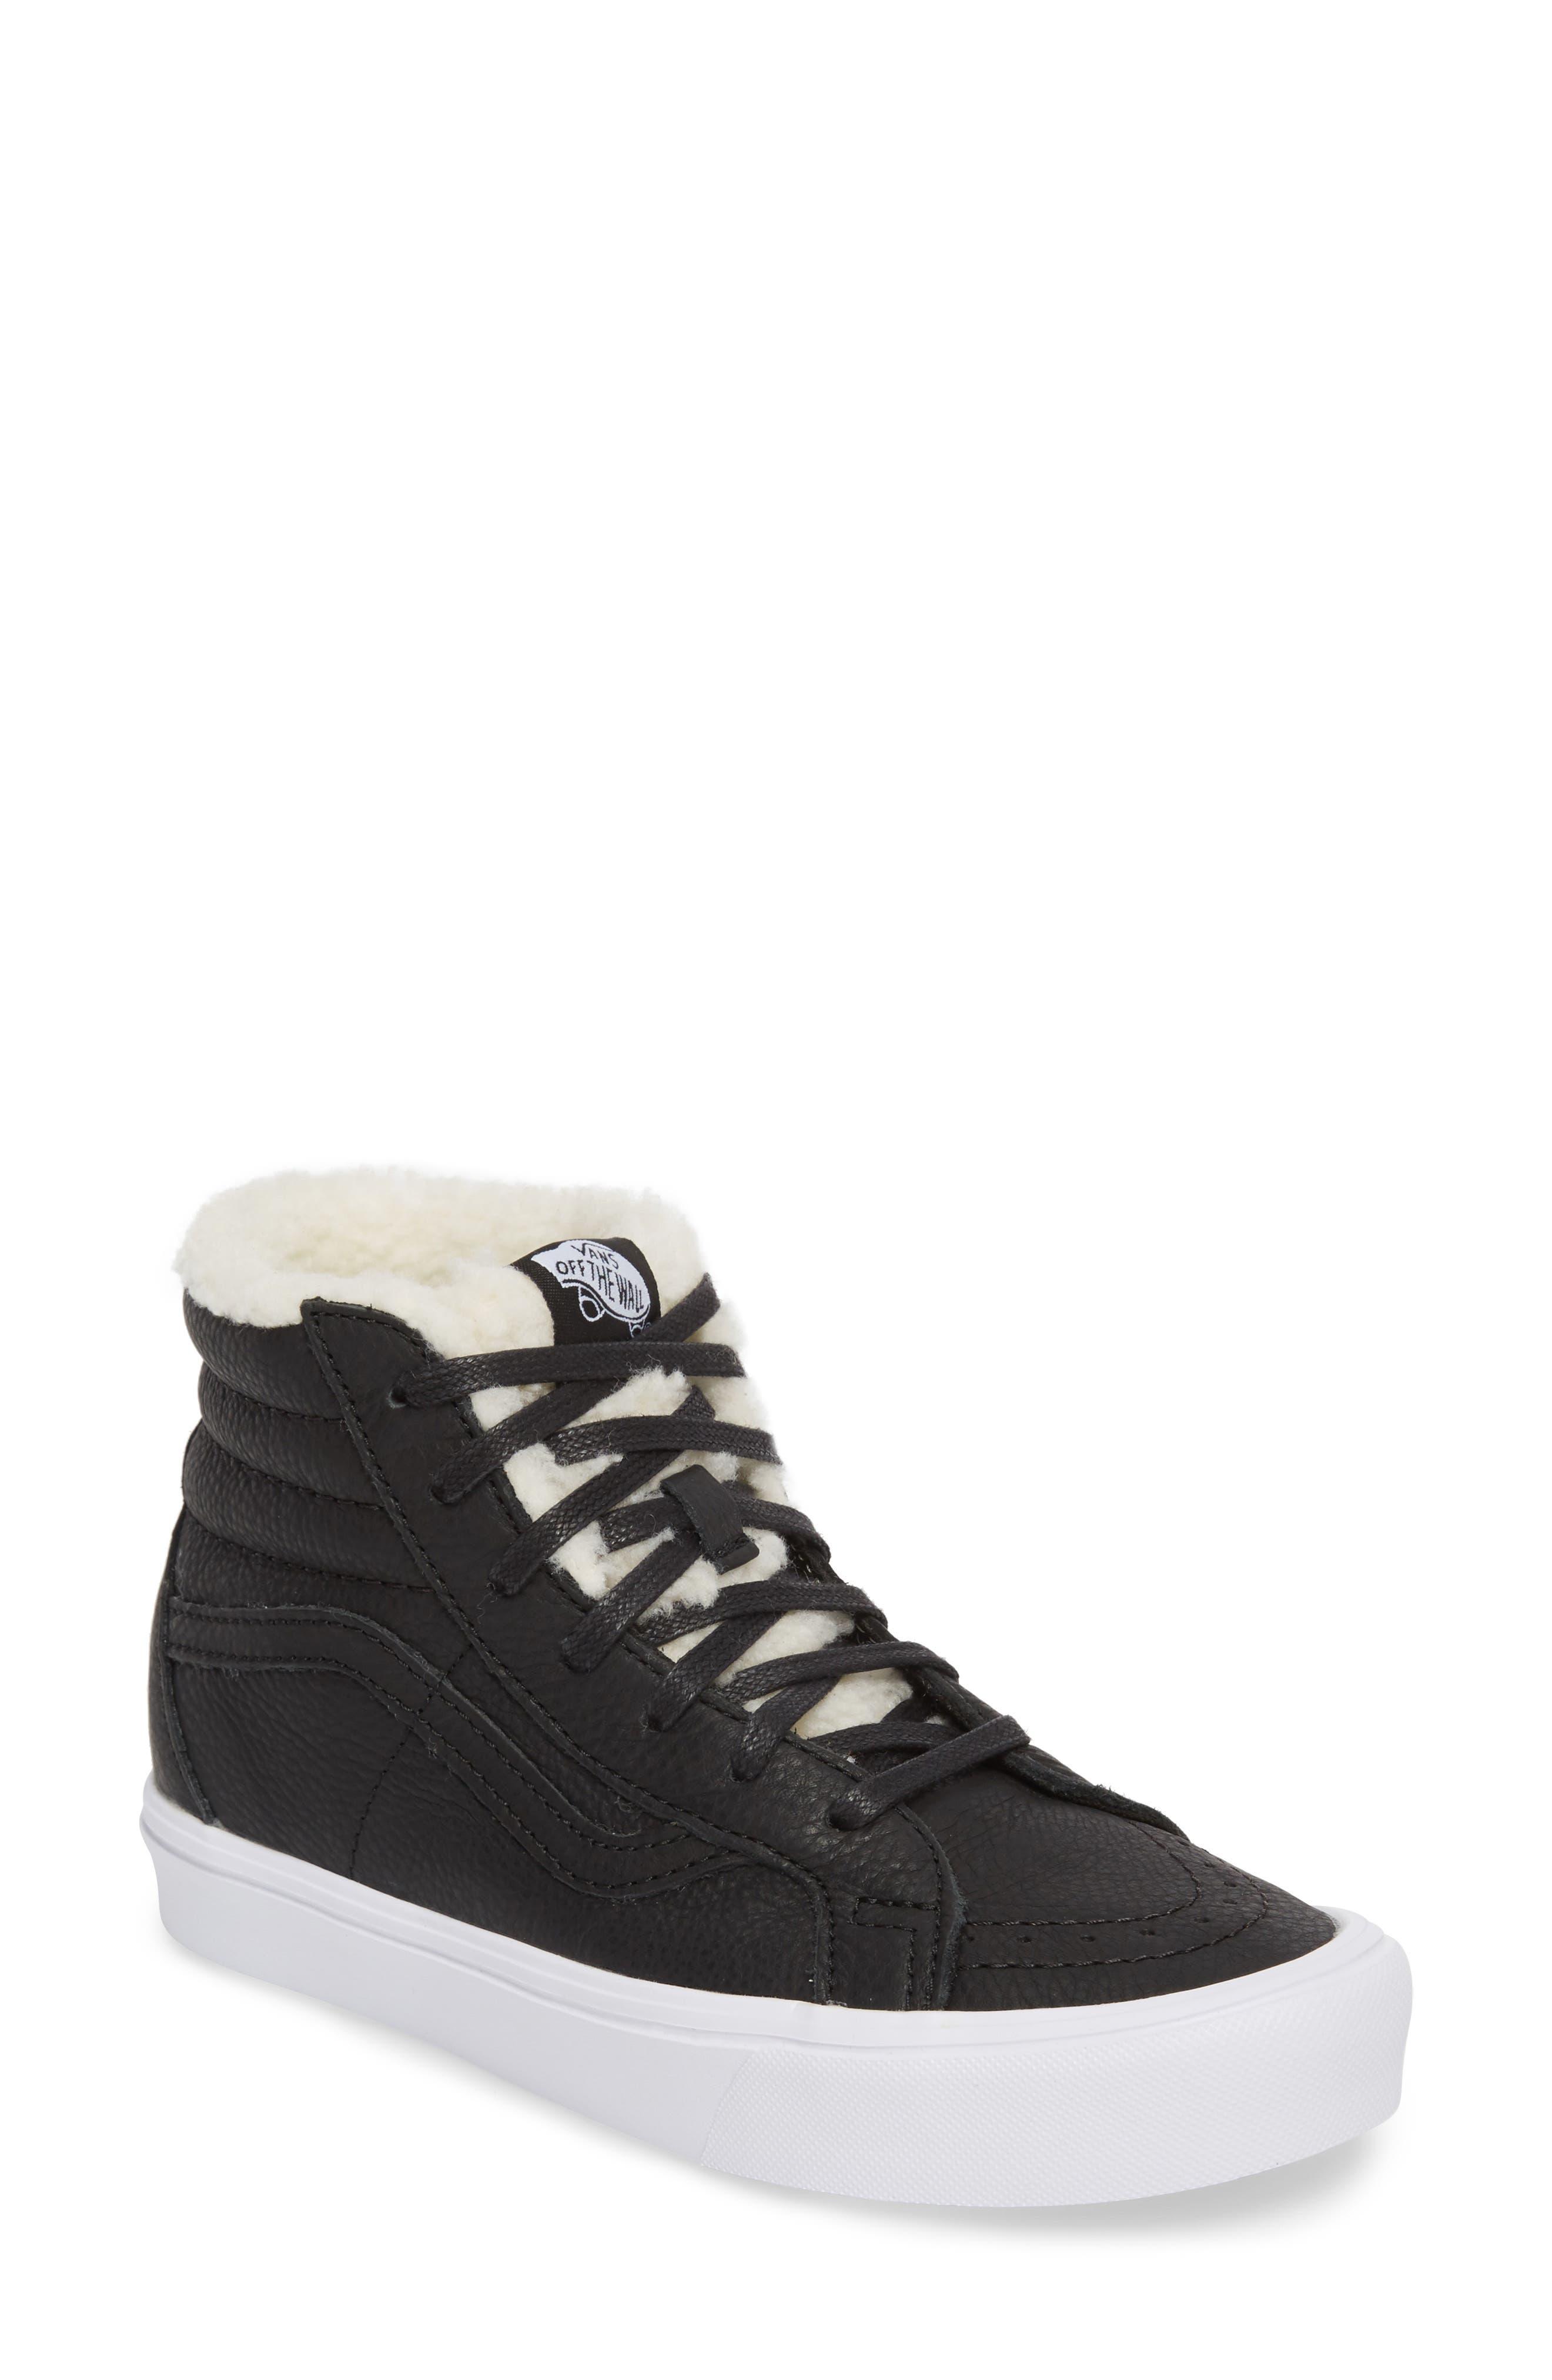 Sk8-Hi Reissue Lite High Top Sneaker,                         Main,                         color,